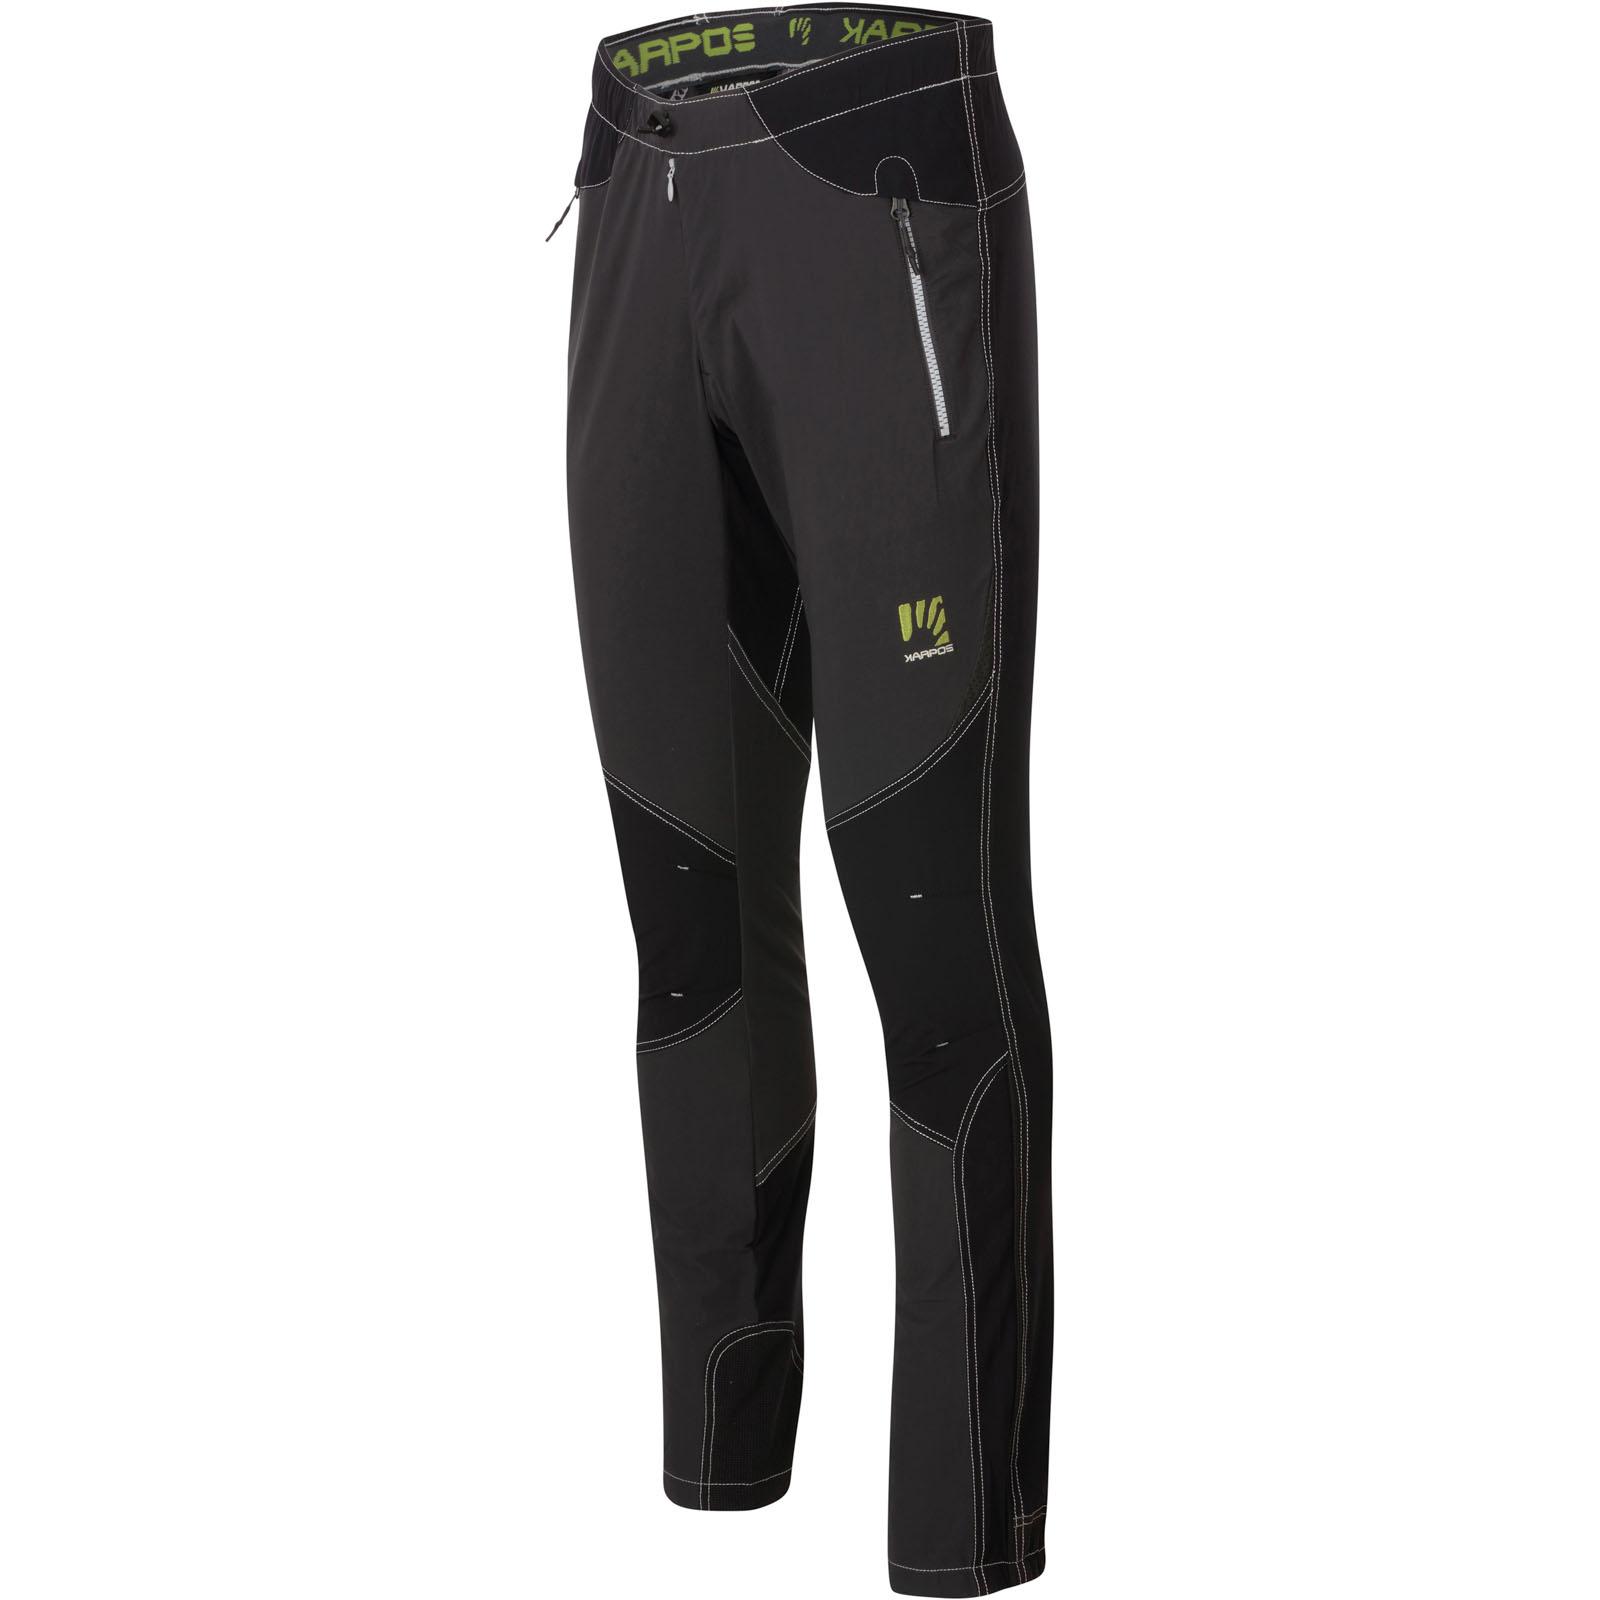 651f6771c97d7 Karpos Rock lezecké nohavice sivé/čierne